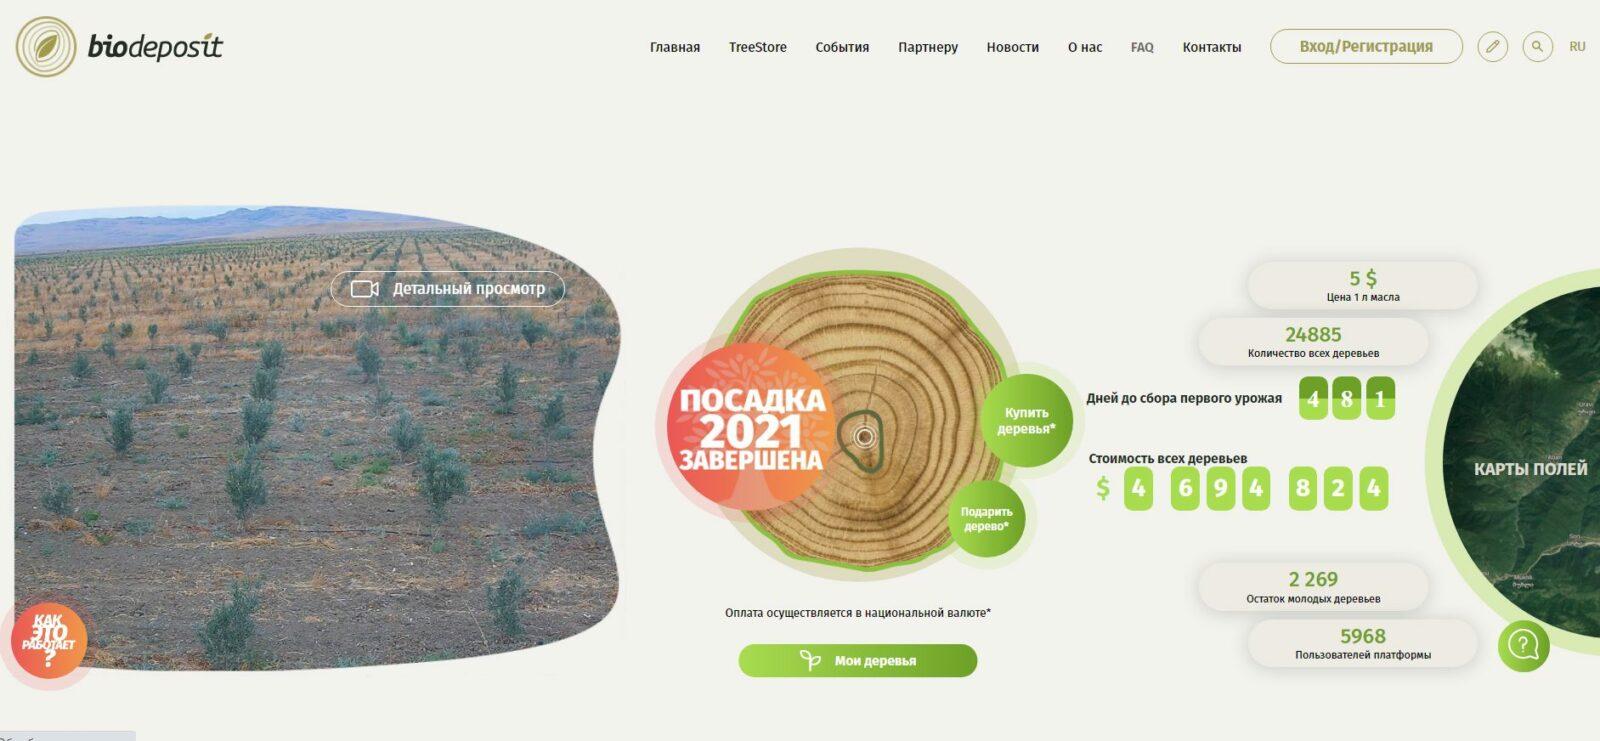 Проект BioDeposit